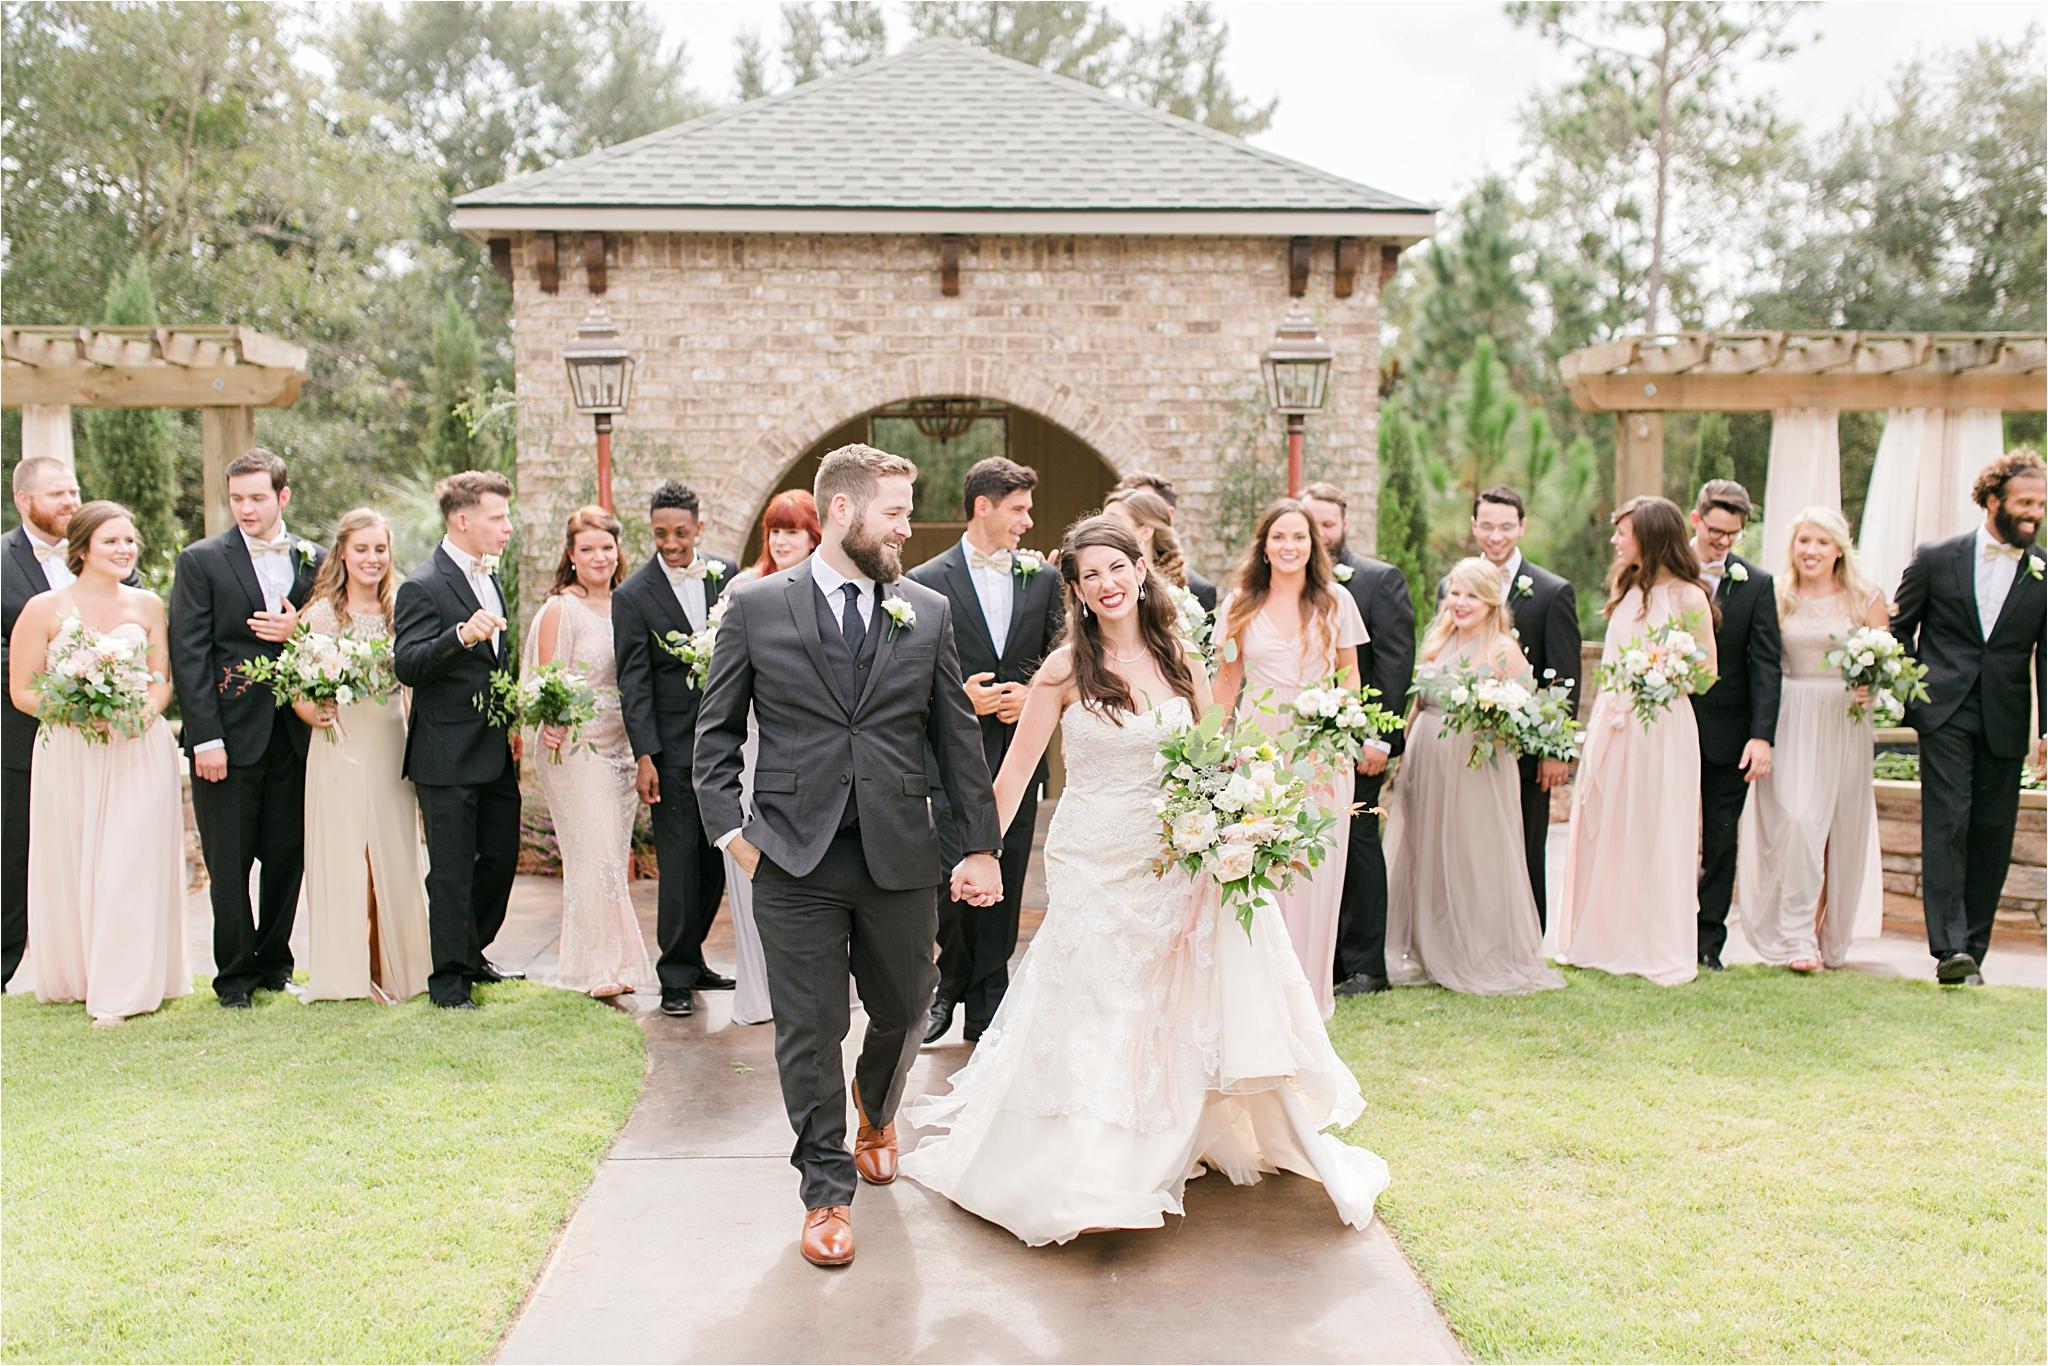 Wedding party-bella sera gardens-alabama-large wedding party-blushes-neutrals-creams